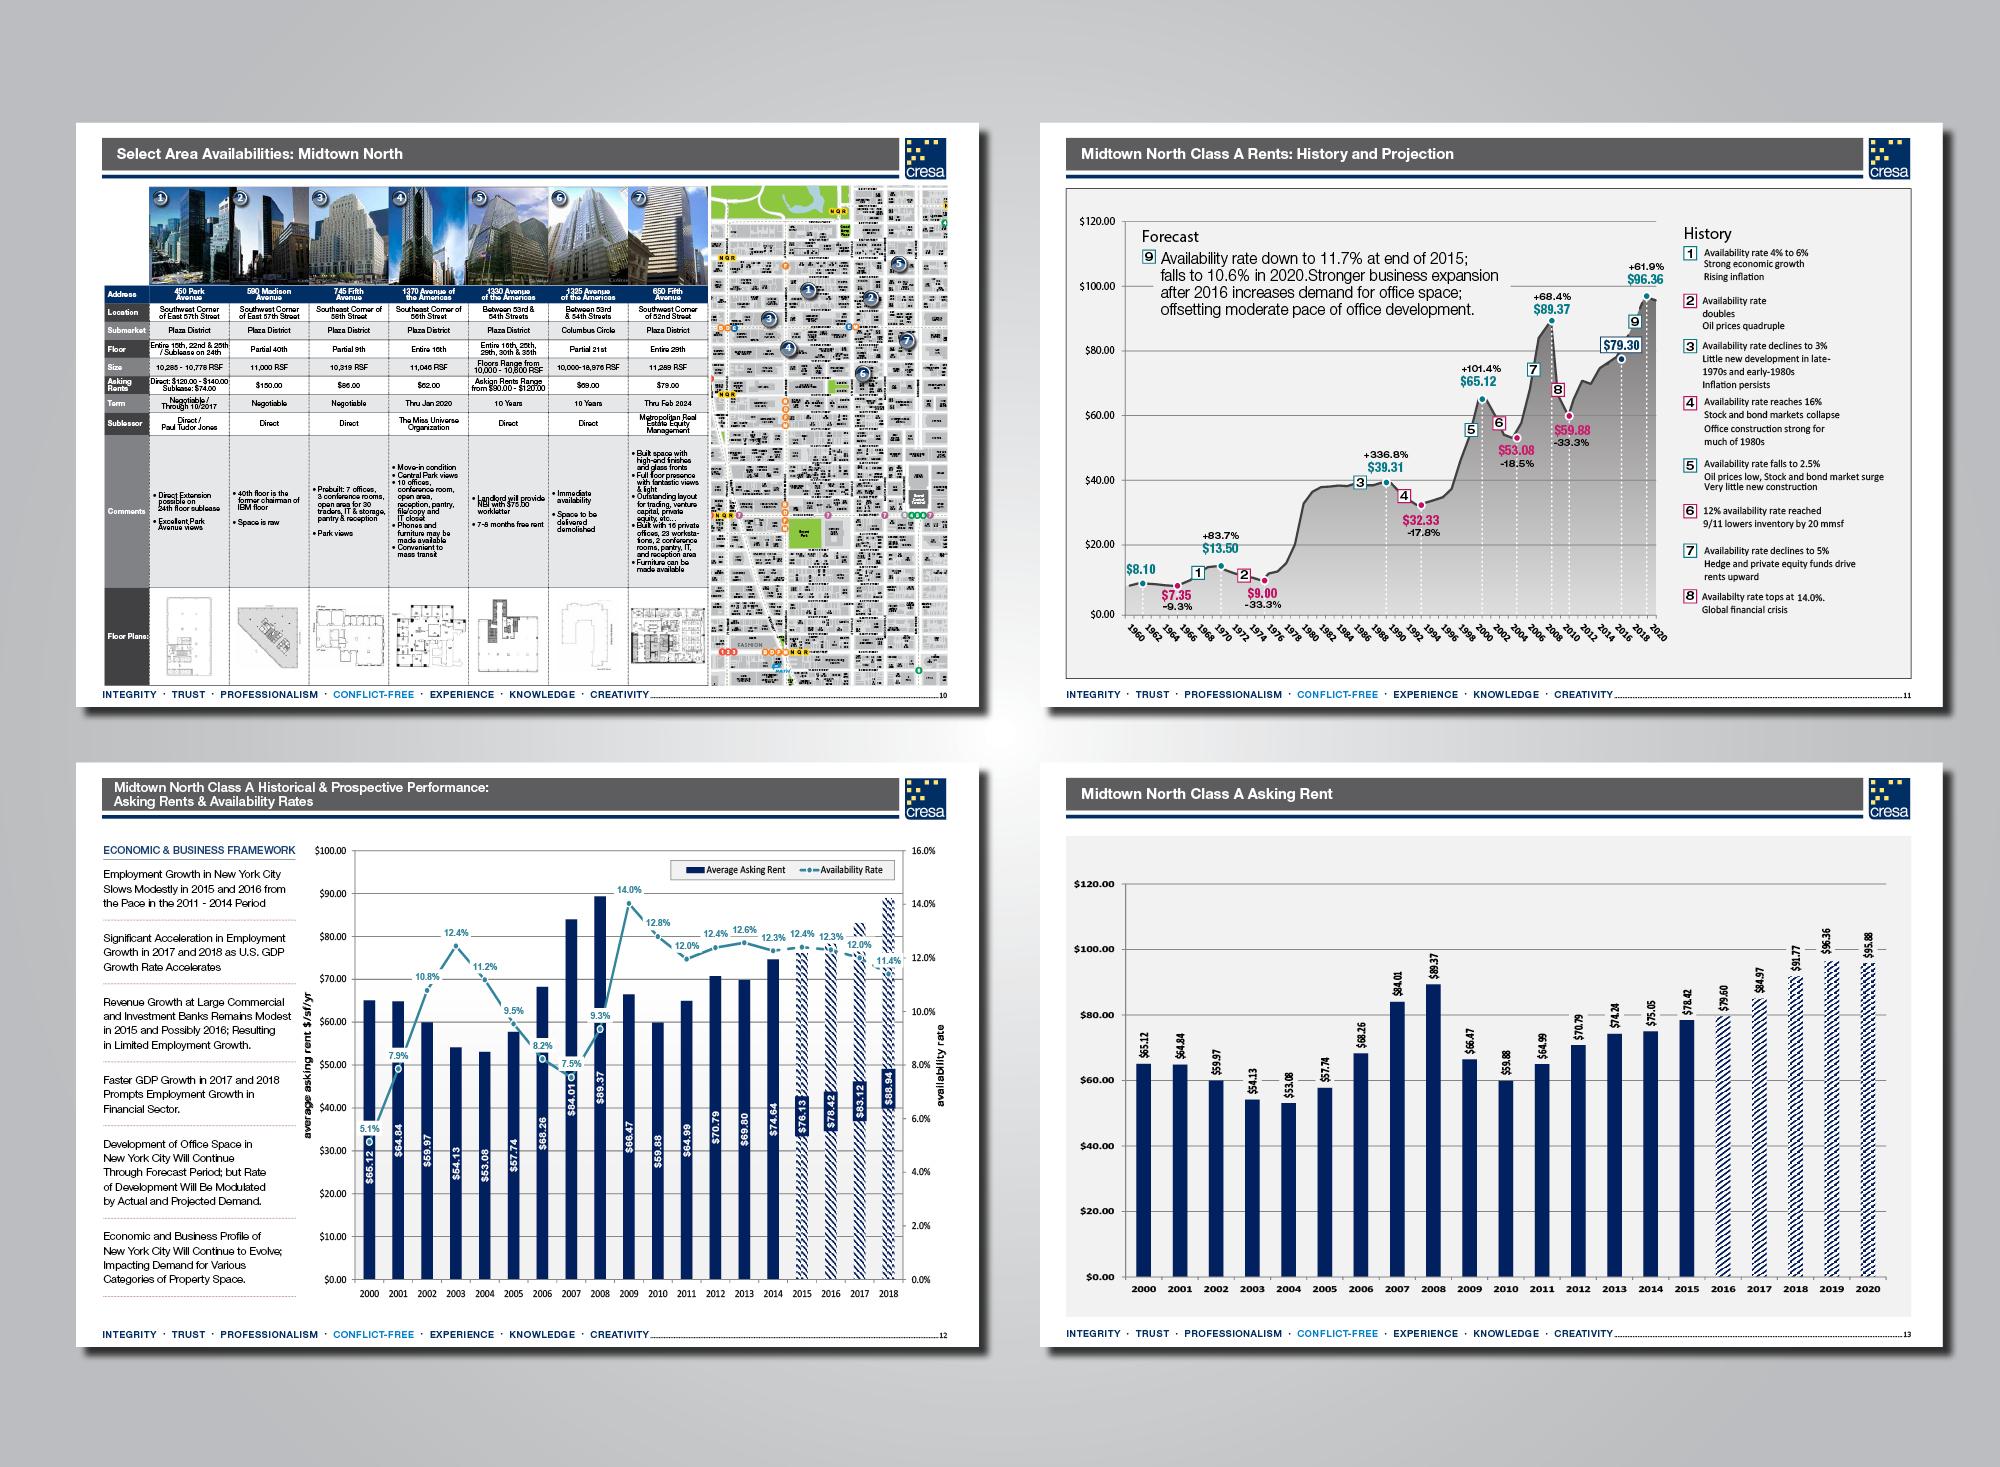 cresa_market_overview_background4.jpg